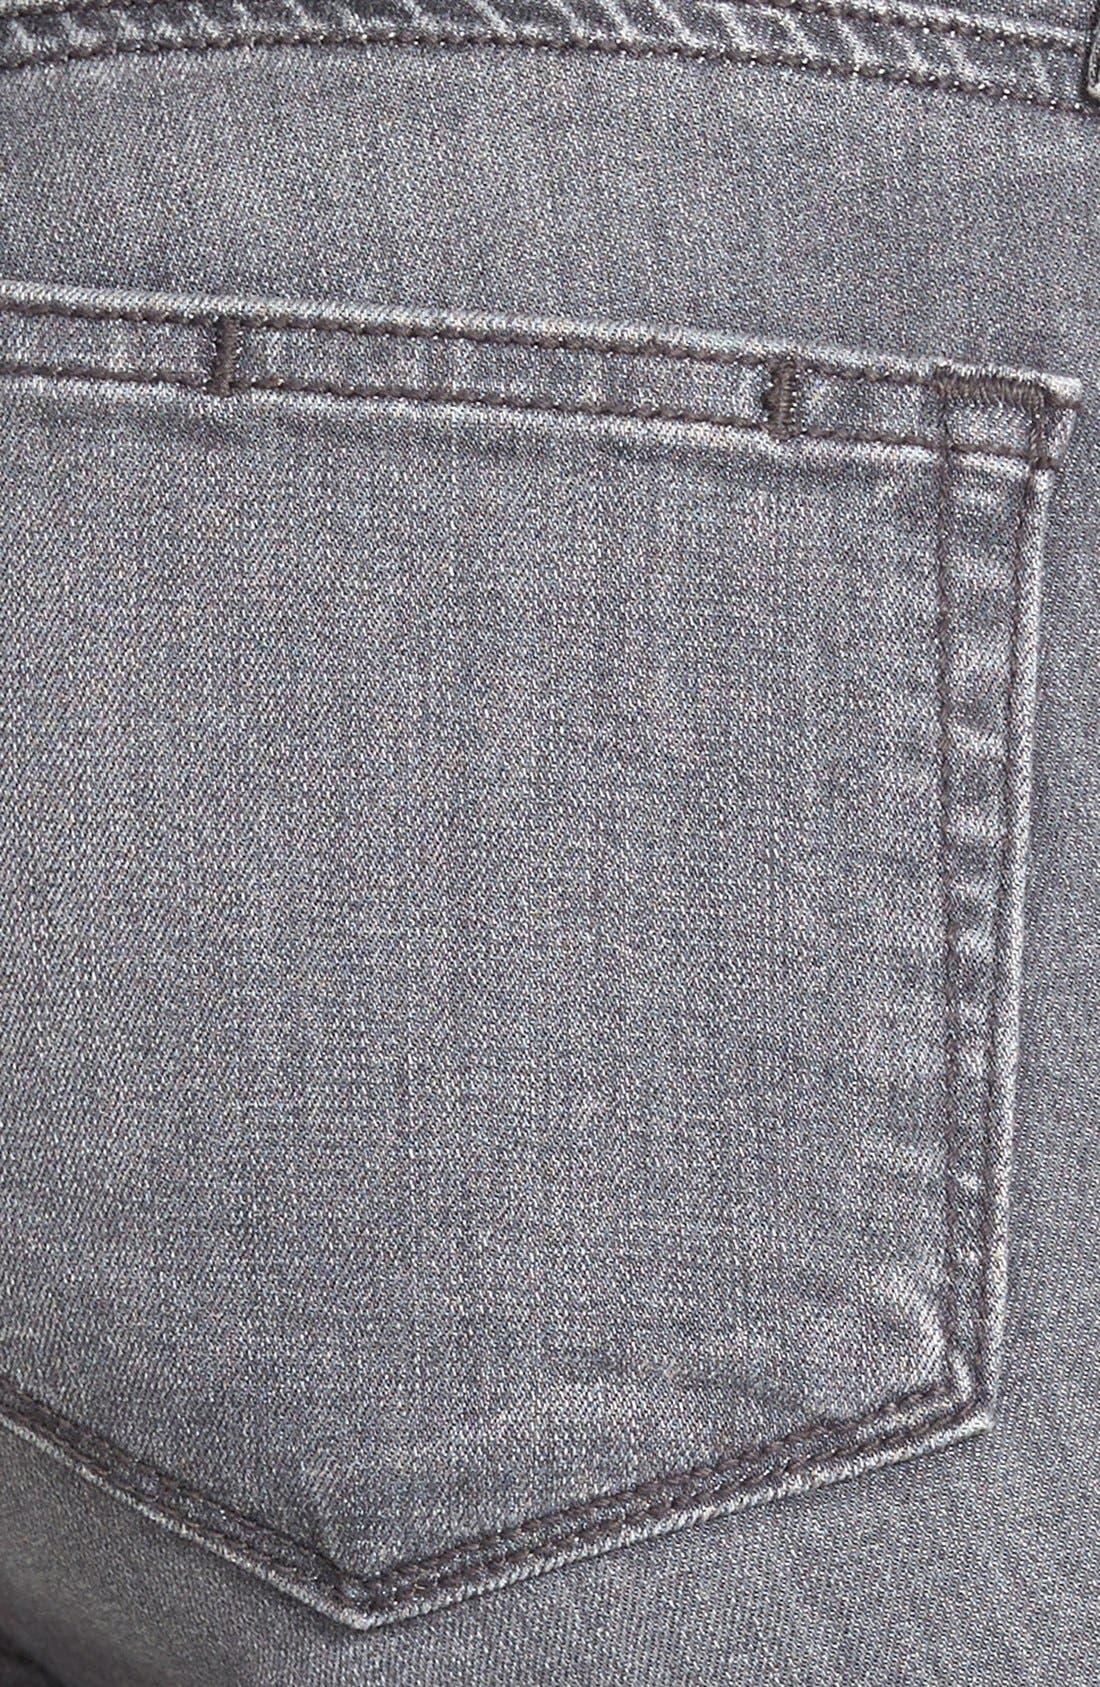 Transcend - Verdugo Ultra Skinny Jeans,                             Alternate thumbnail 3, color,                             SILVIE